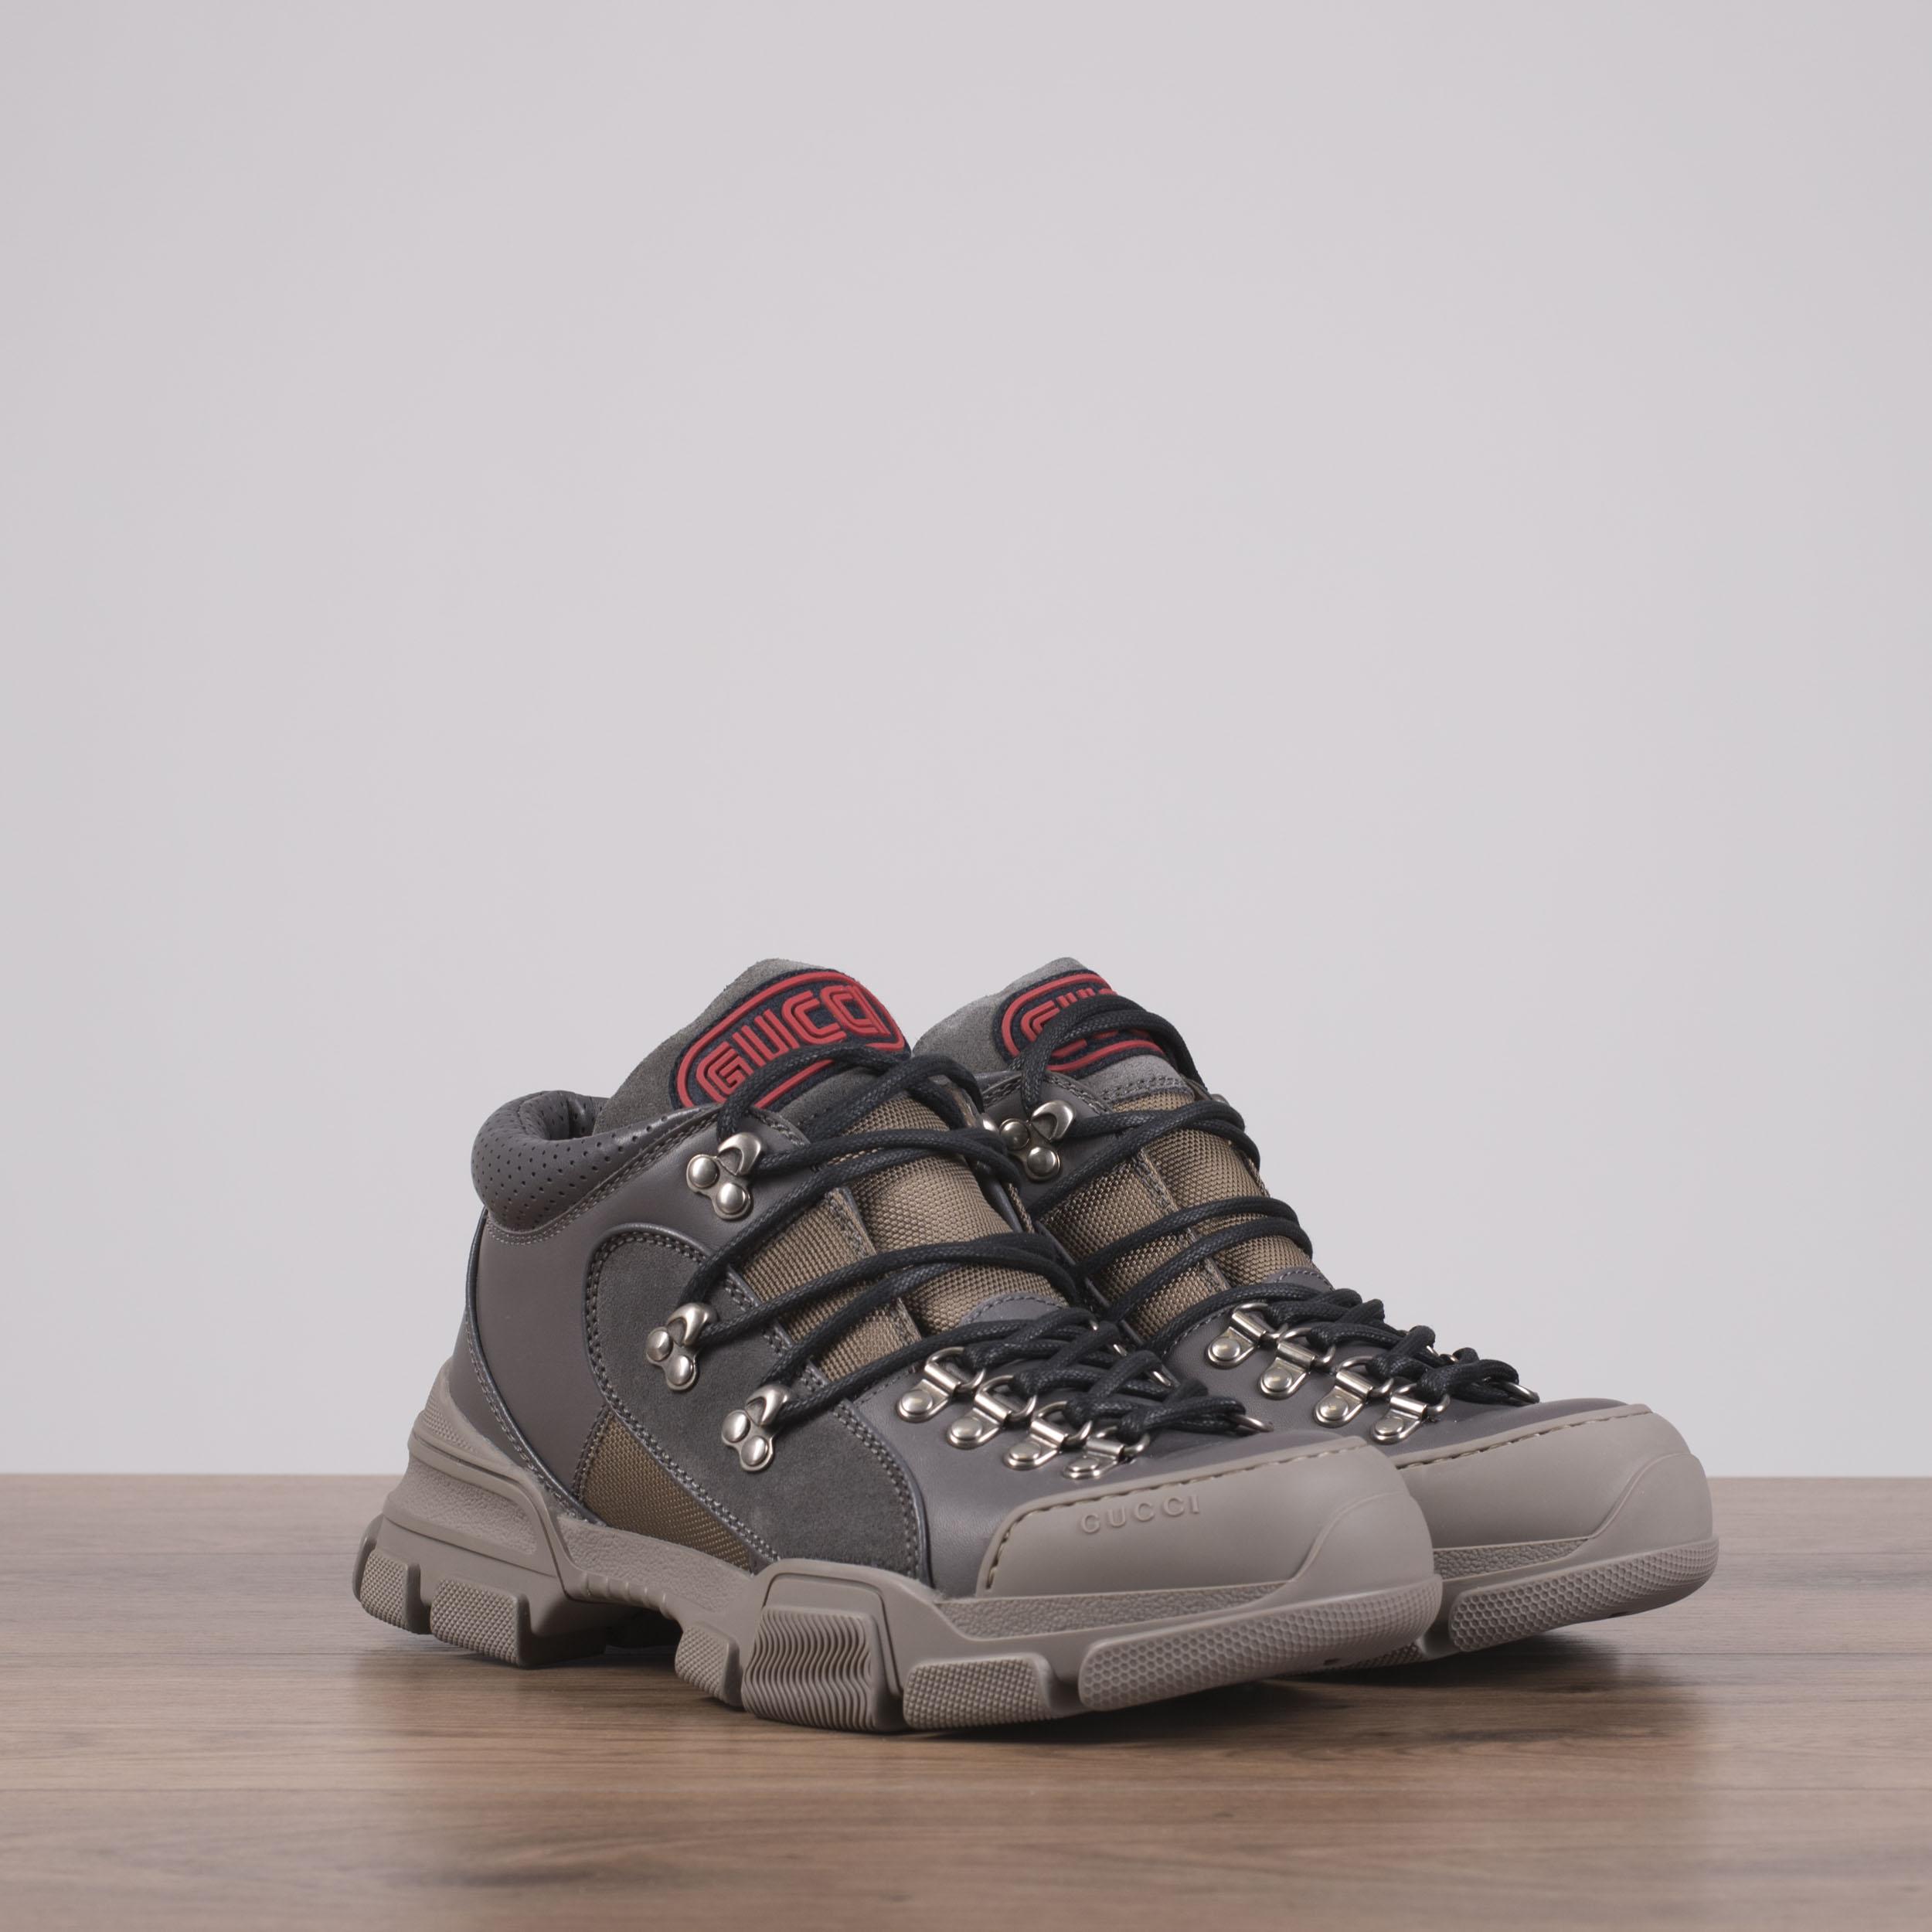 bd58b2ca7 GUCCI x SEGA 980$ Flashtrek Sneakers In Grey Canvas, Leather & Suede ...